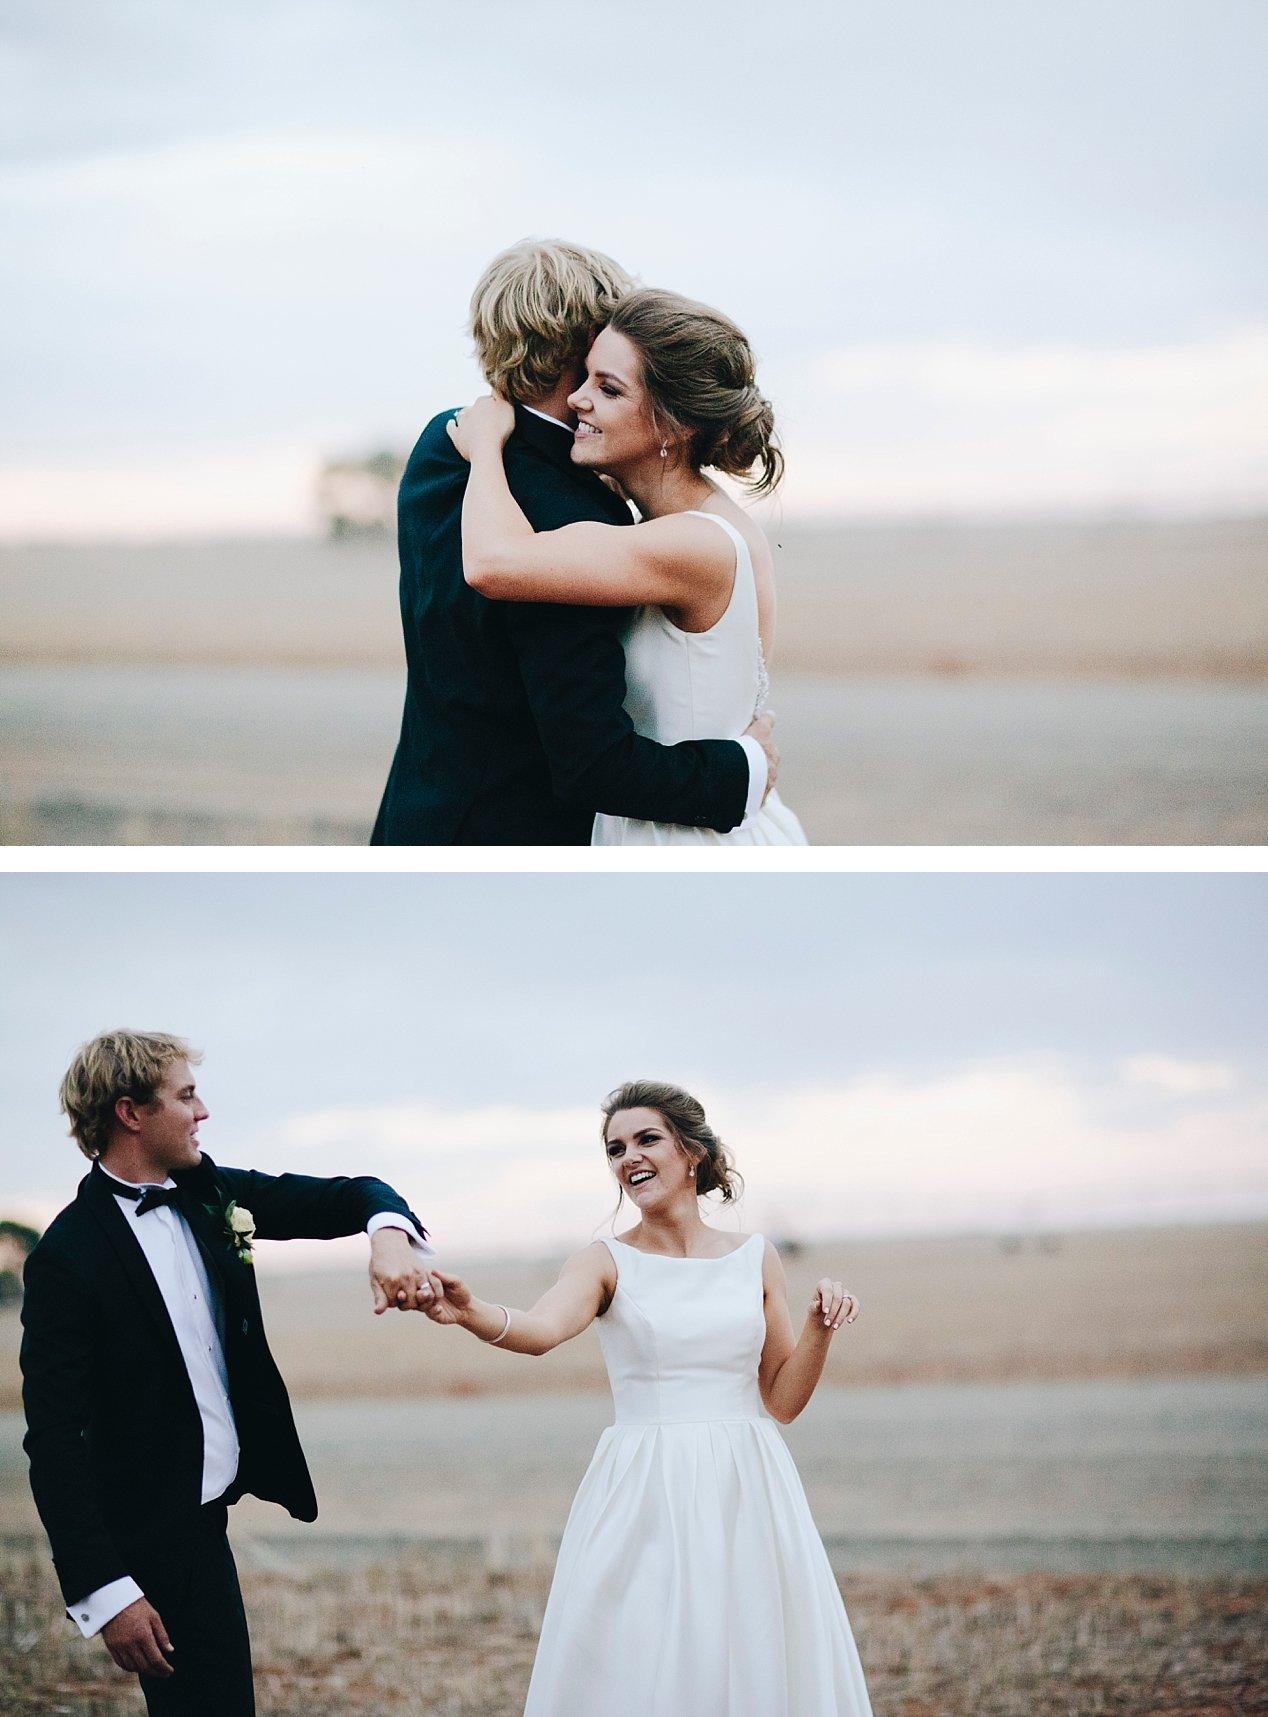 Jerilderie Wedding by Wagga Wagga Wedding Photographer Peppermint Studios_Deniliquin weddings_0087